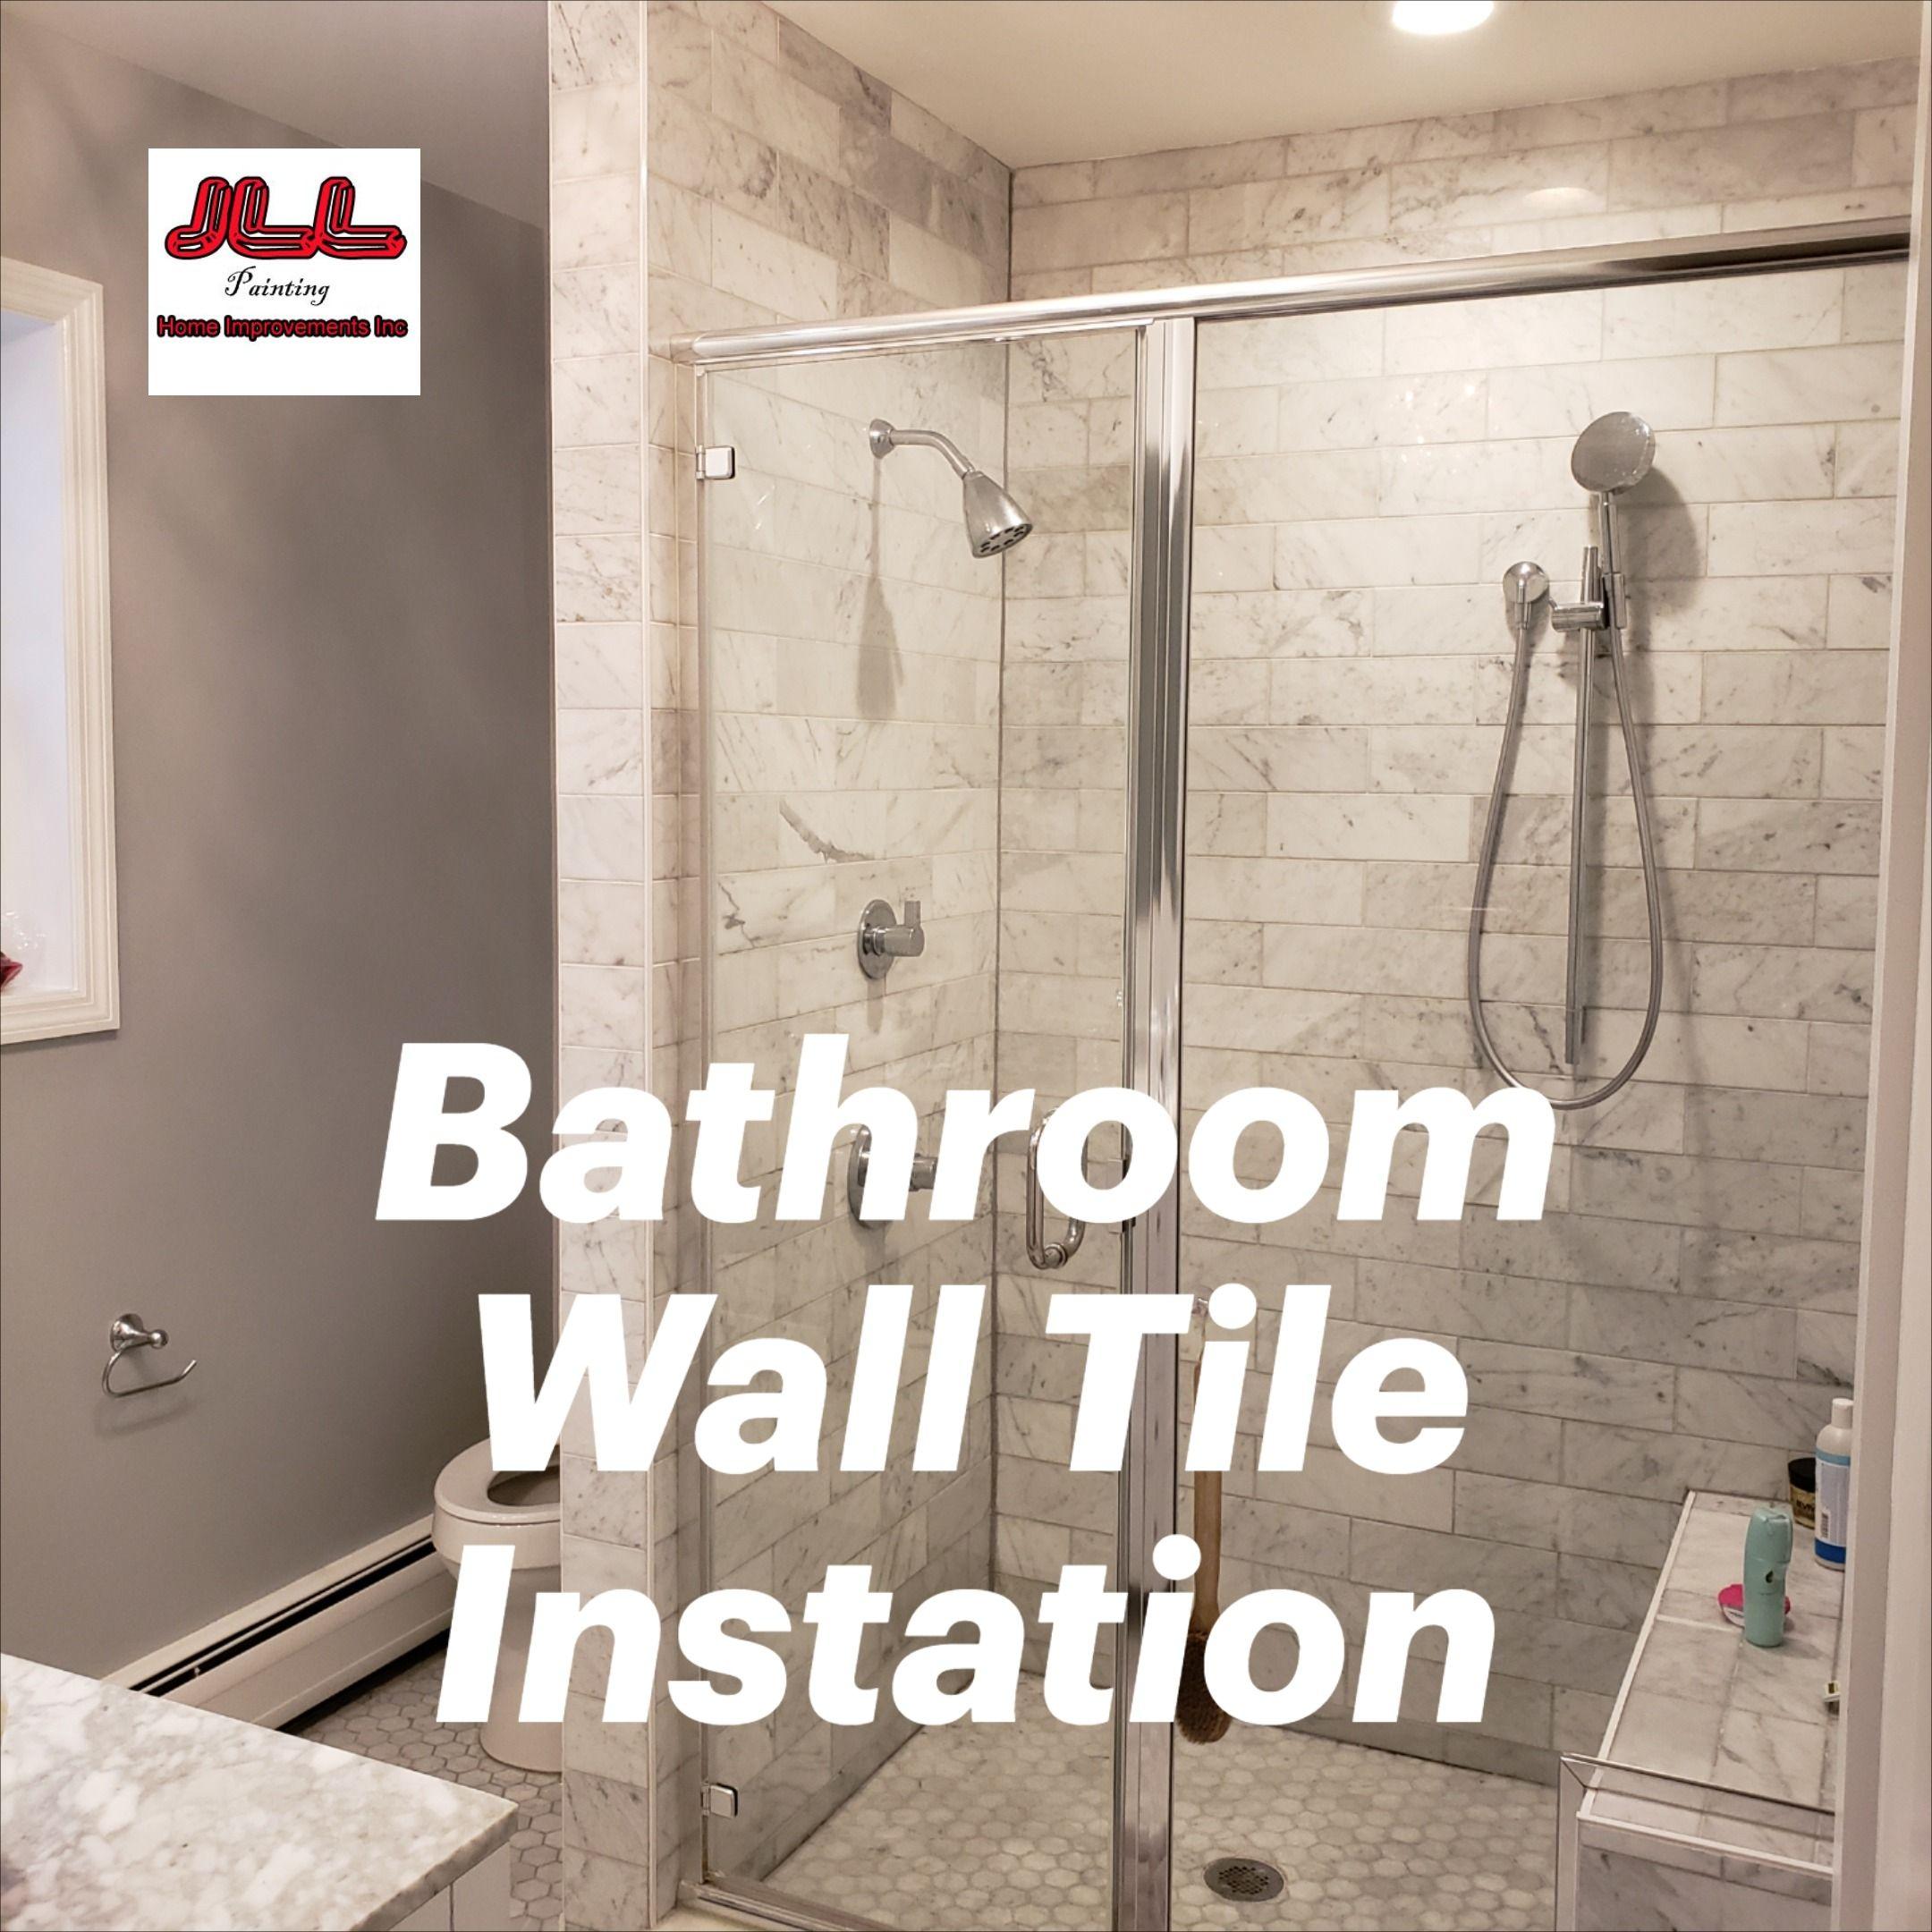 Tile Installers Near Me in 2020 Bathroom tile